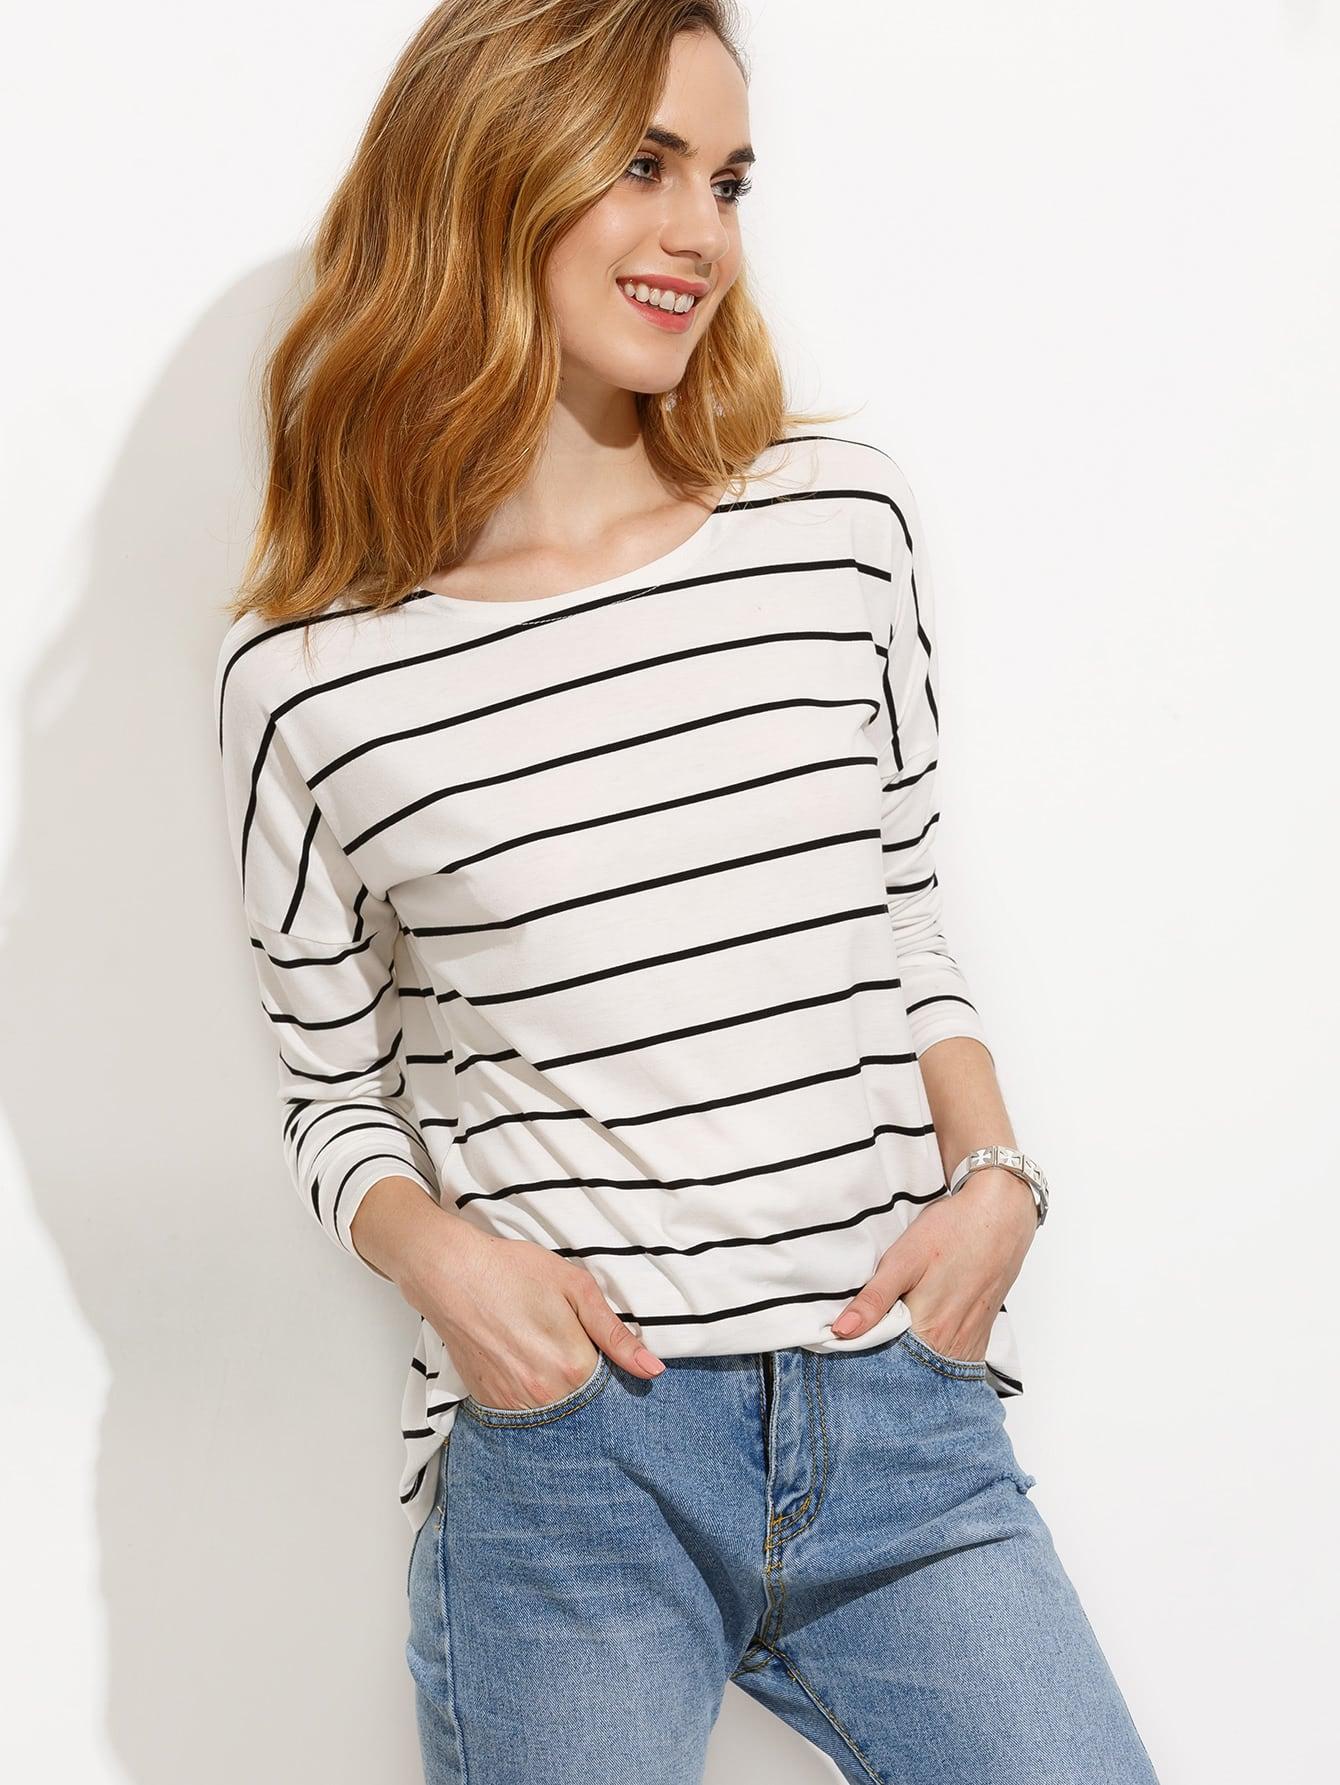 White Striped Drop Shoulder T-shirt, Black and white – купить по цене 9.95 руб. в romwe.com | imall.com